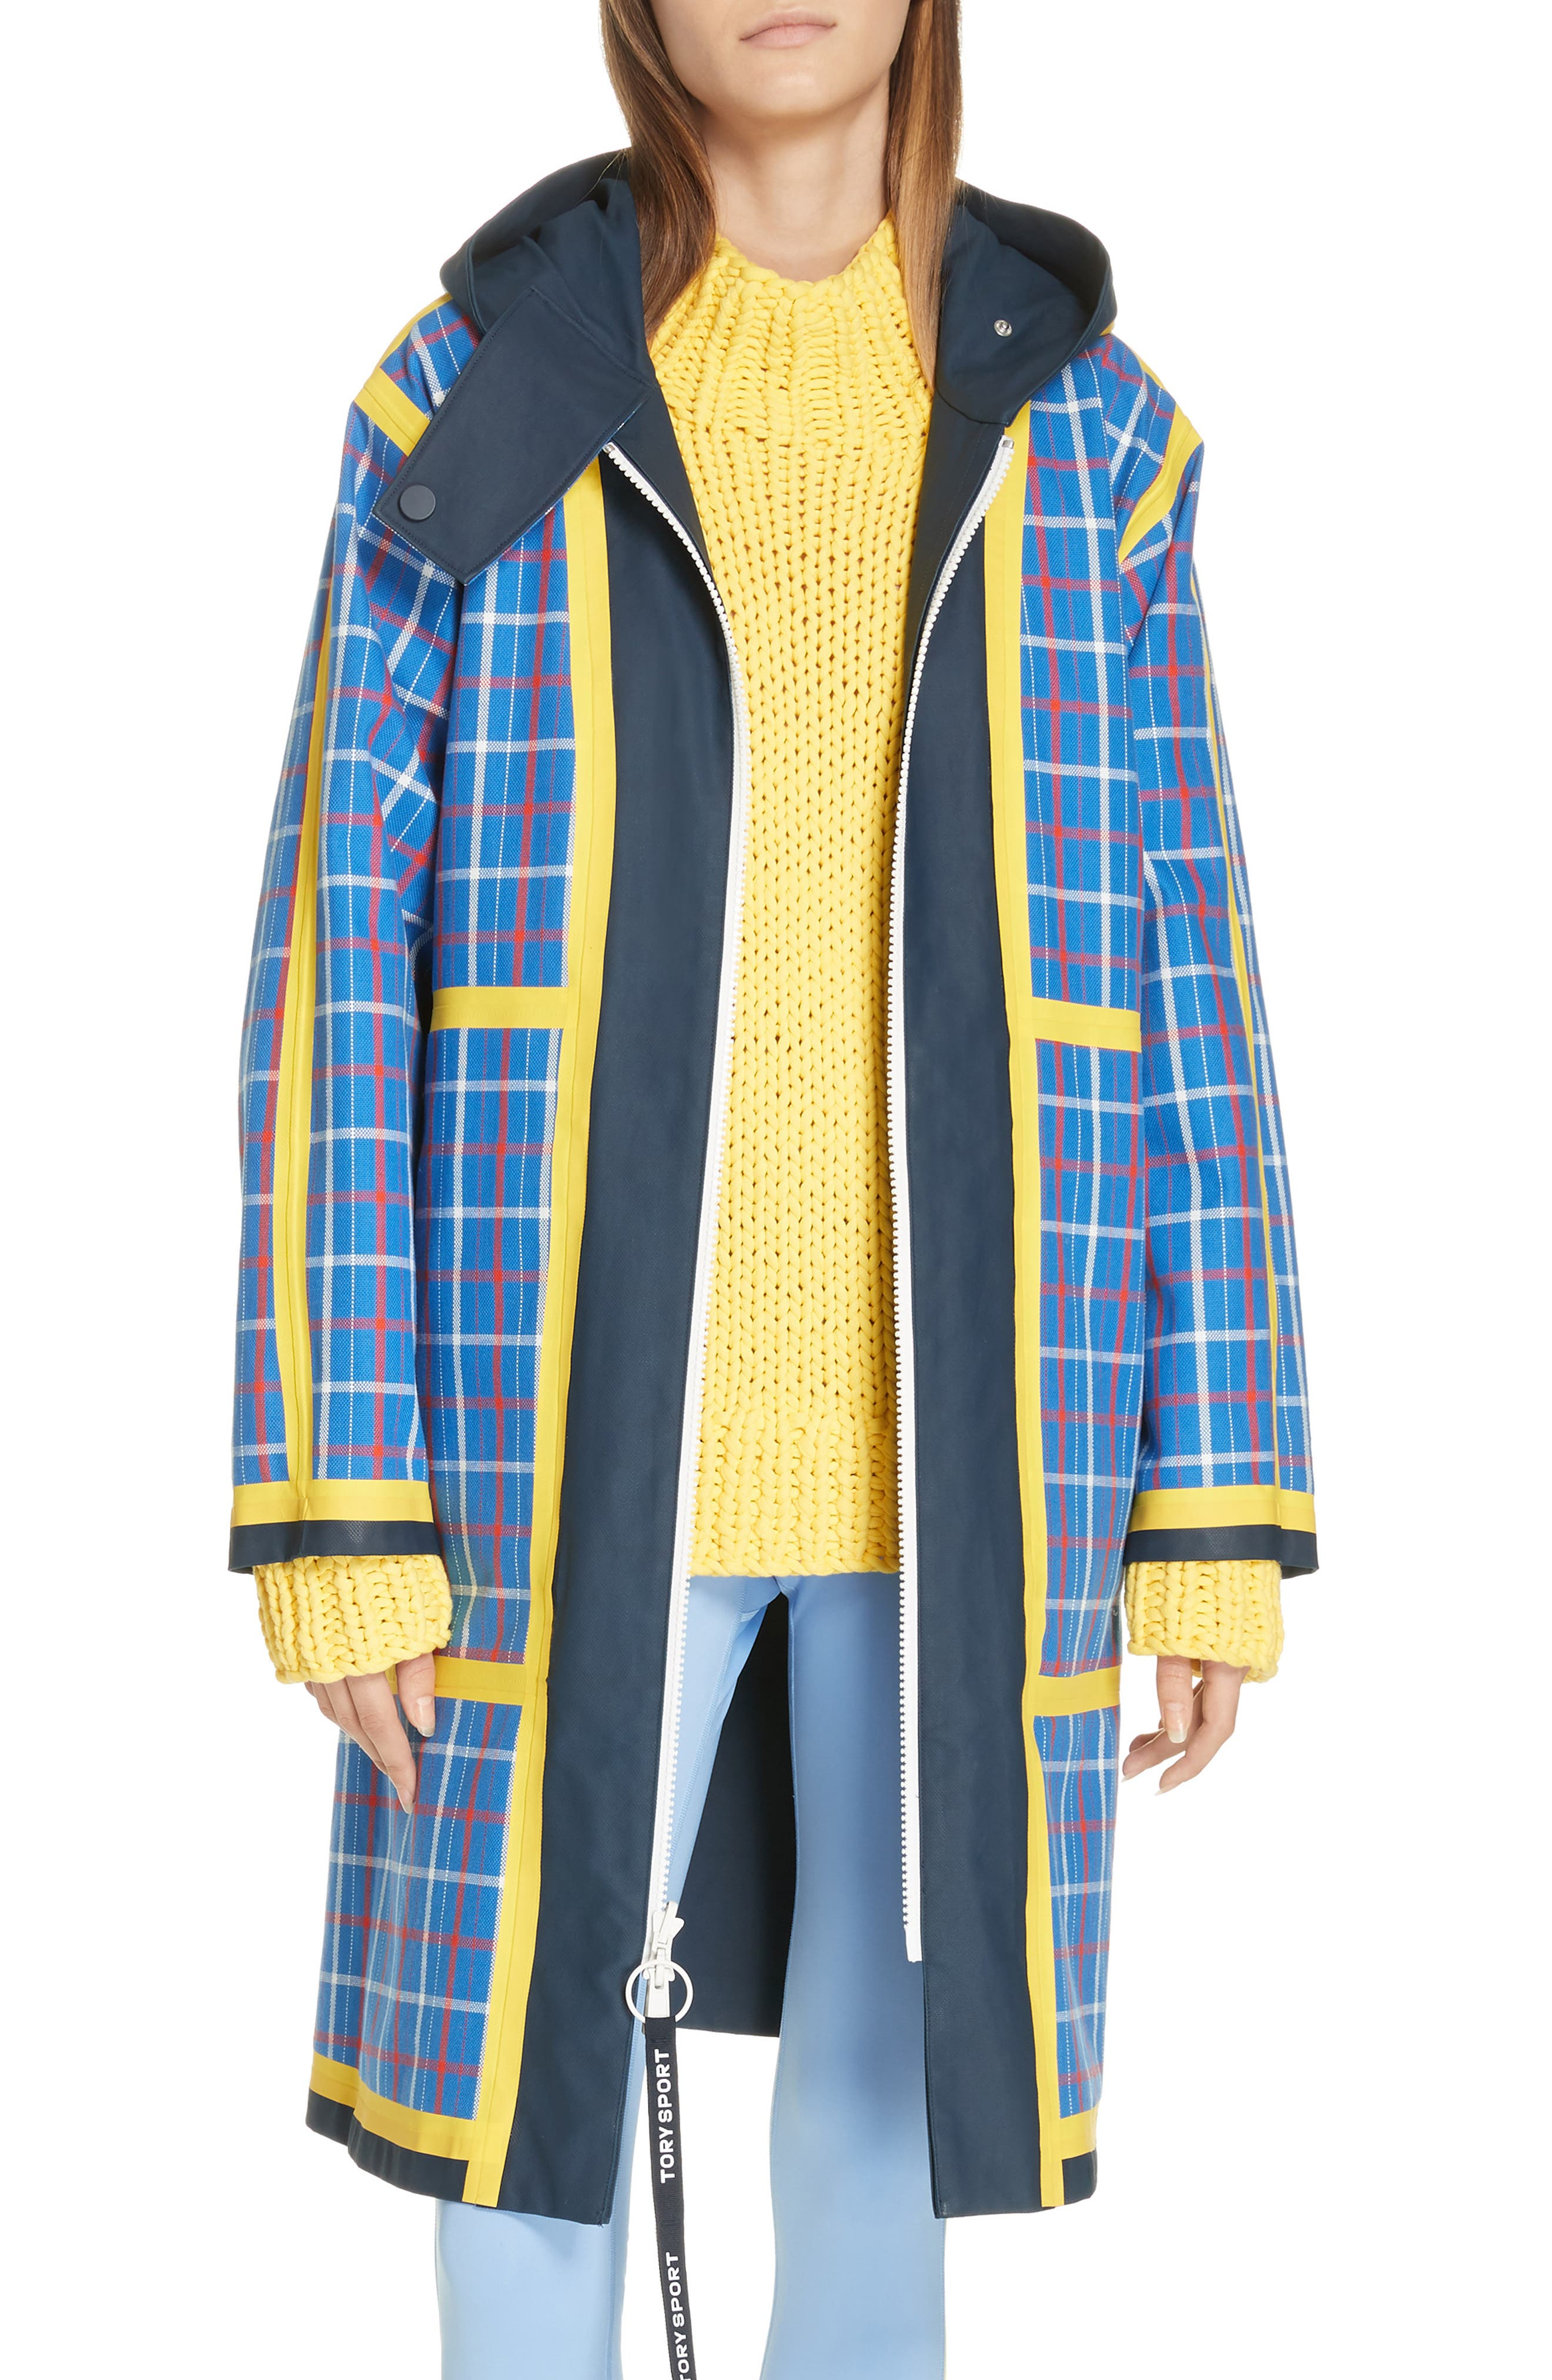 TORY SPORT, Reversible Coated Canvas Rain Coat, Main thumbnail 1, color, TANDEM PLAID LARGE SURF BLUE